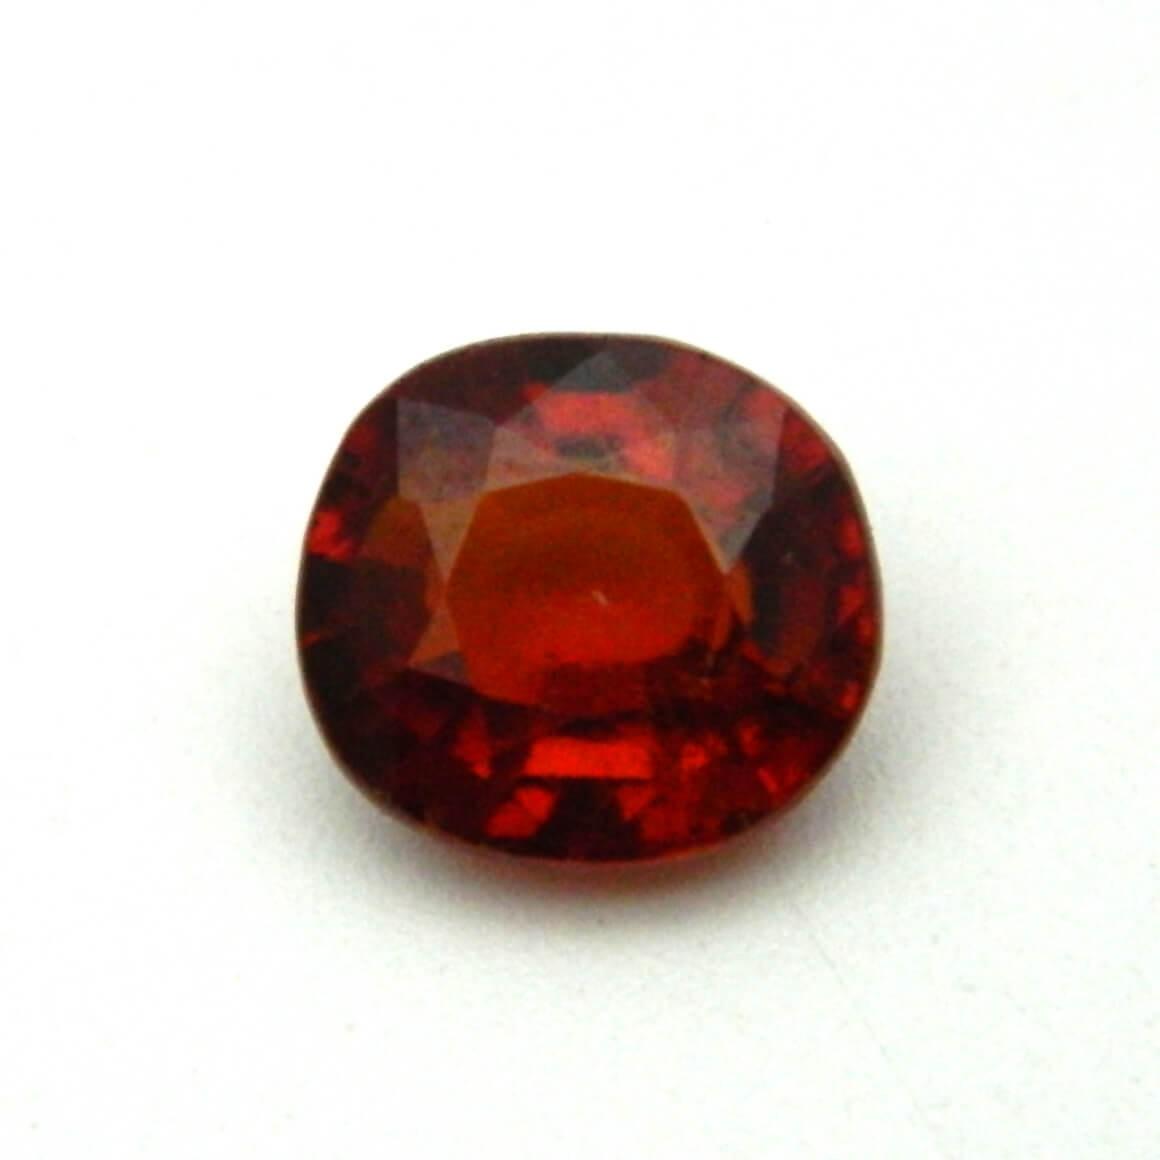 6.12 Carat/ 6.79 Ratti Natural Ceylon Hessonite Garnet (Gomed) Gemstone